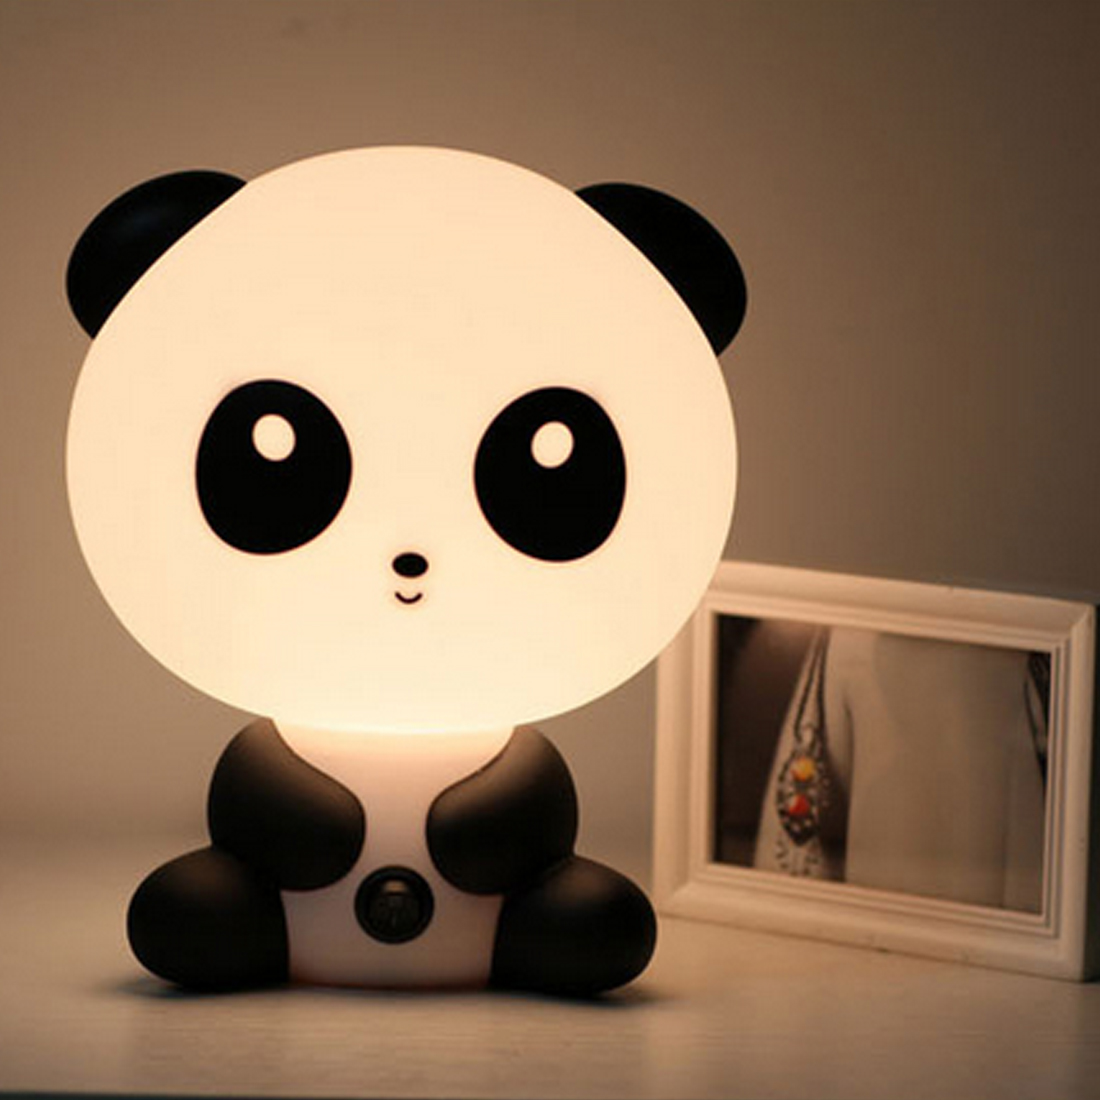 EU Plug Baby Bedroom Lamps Night Light Cartoon Pets Rabbit Panda PVC Plastic Sleep Led Kid Lamp Bulb Nightlight for Kids itimo led night light baby sleeping kids bedside light bedroom decoration cartoon star night lamps novelty nightlight